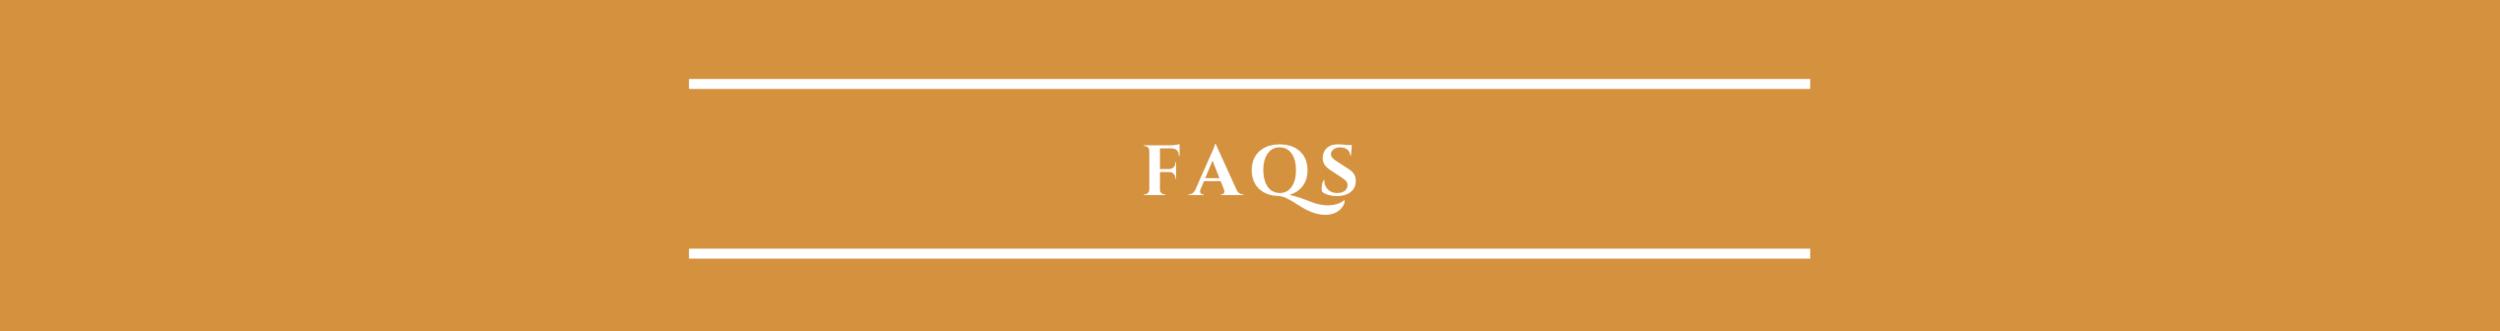 Banner Taste of Teo FAQs.png